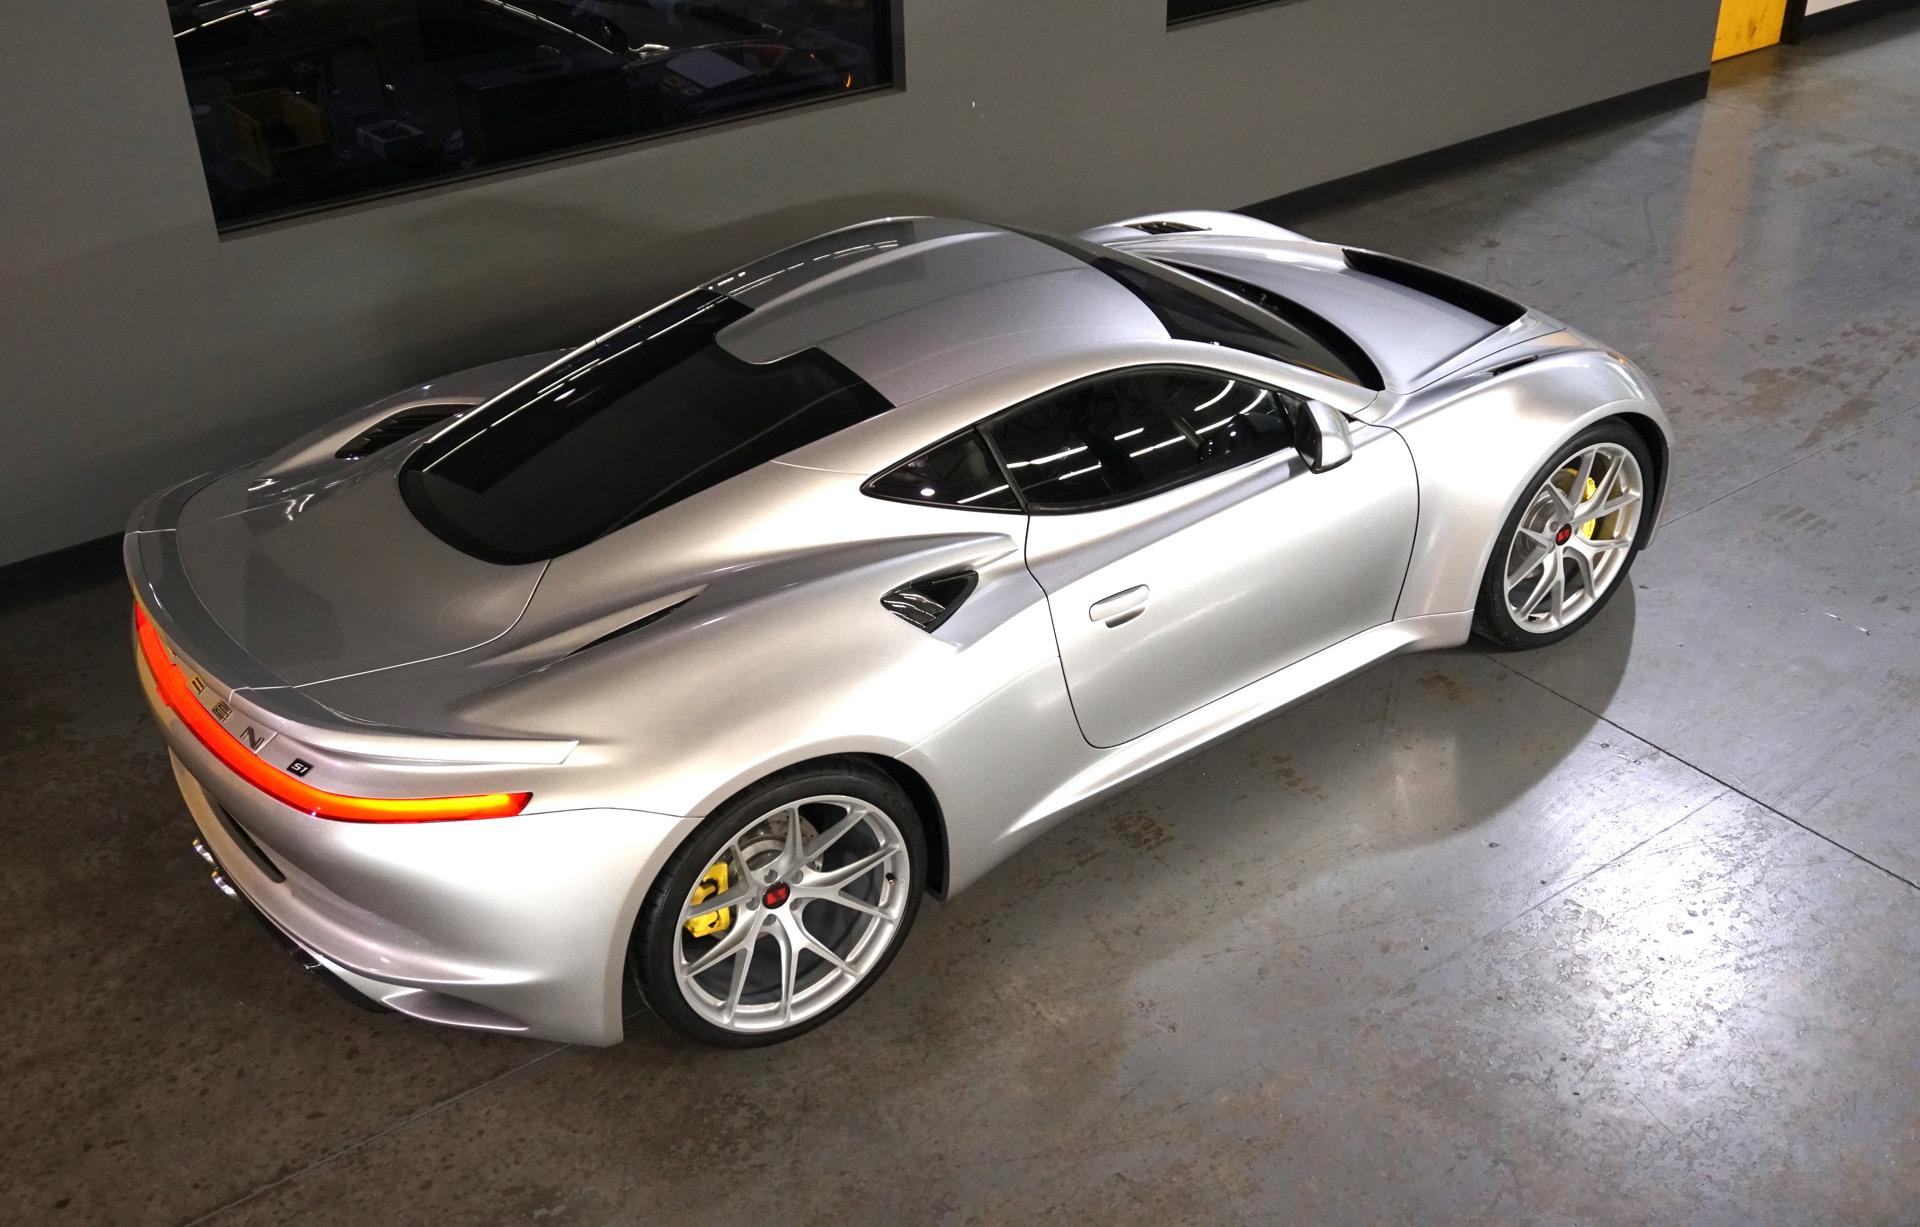 Saleen S1, Aria FXE, Aston Martin Vantage: Car News Headlines